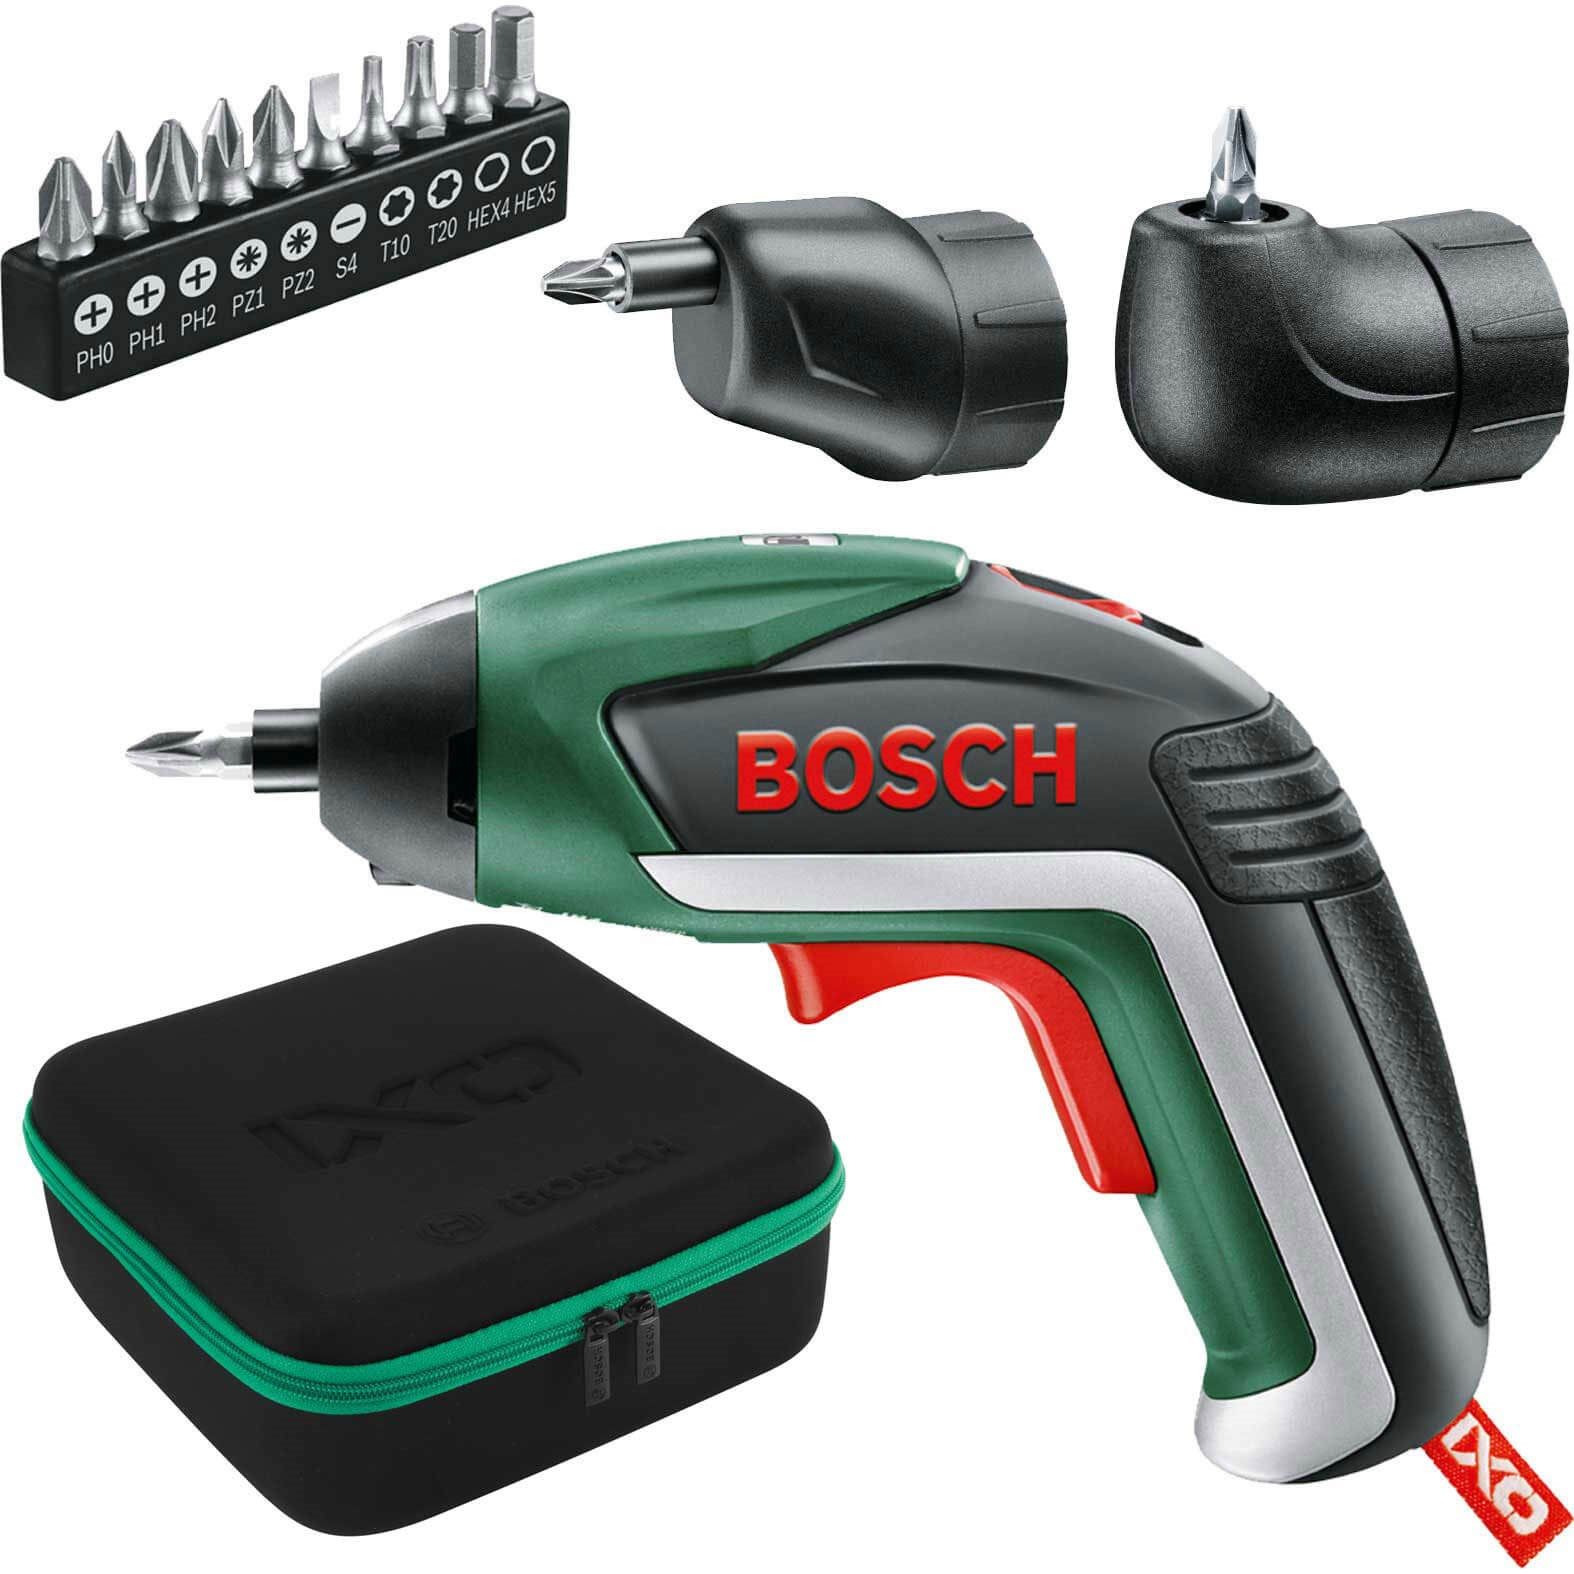 bosch ixo v 3.6v cordless screwdrive & ofset angle adaptor